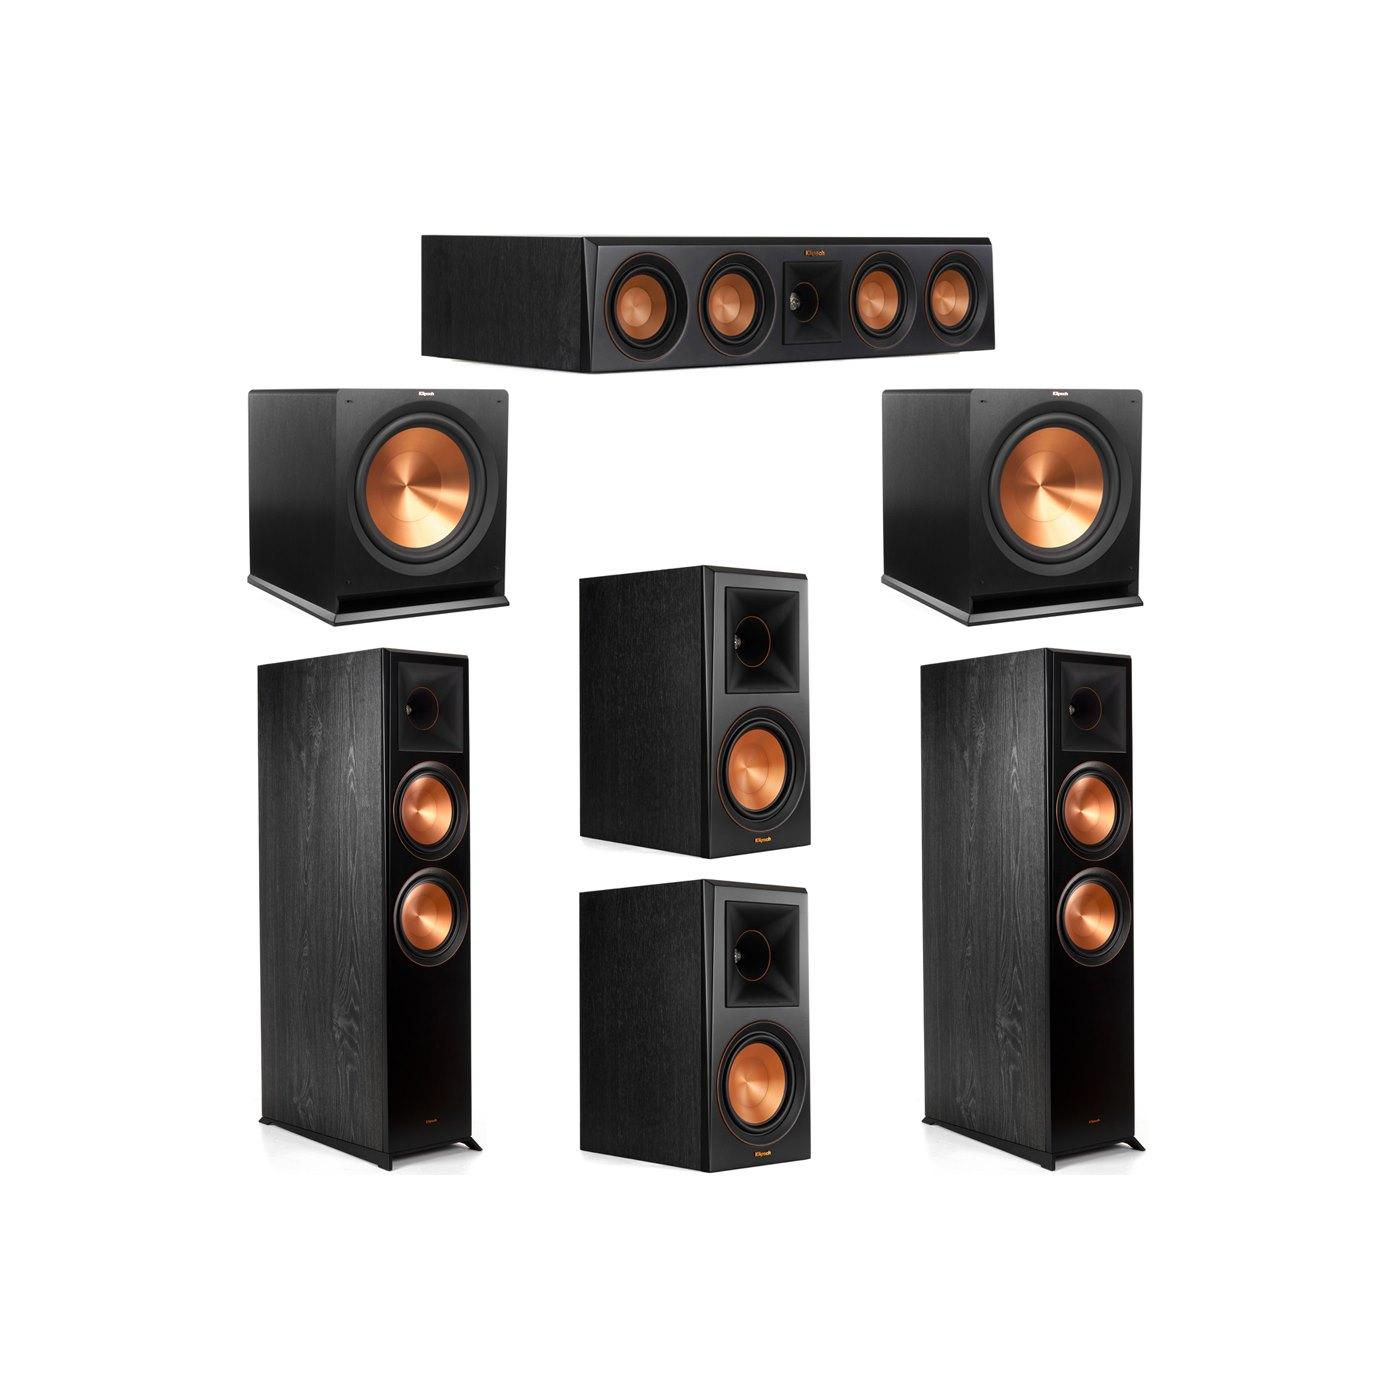 Klipsch 5.2 System with 2 RP-8000F Floorstanding Speakers, 1 Klipsch RP-404C Center Speaker, 2 Klipsch RP-600M Surround Speakers, 2 Klipsch R-115SW Subwoofers